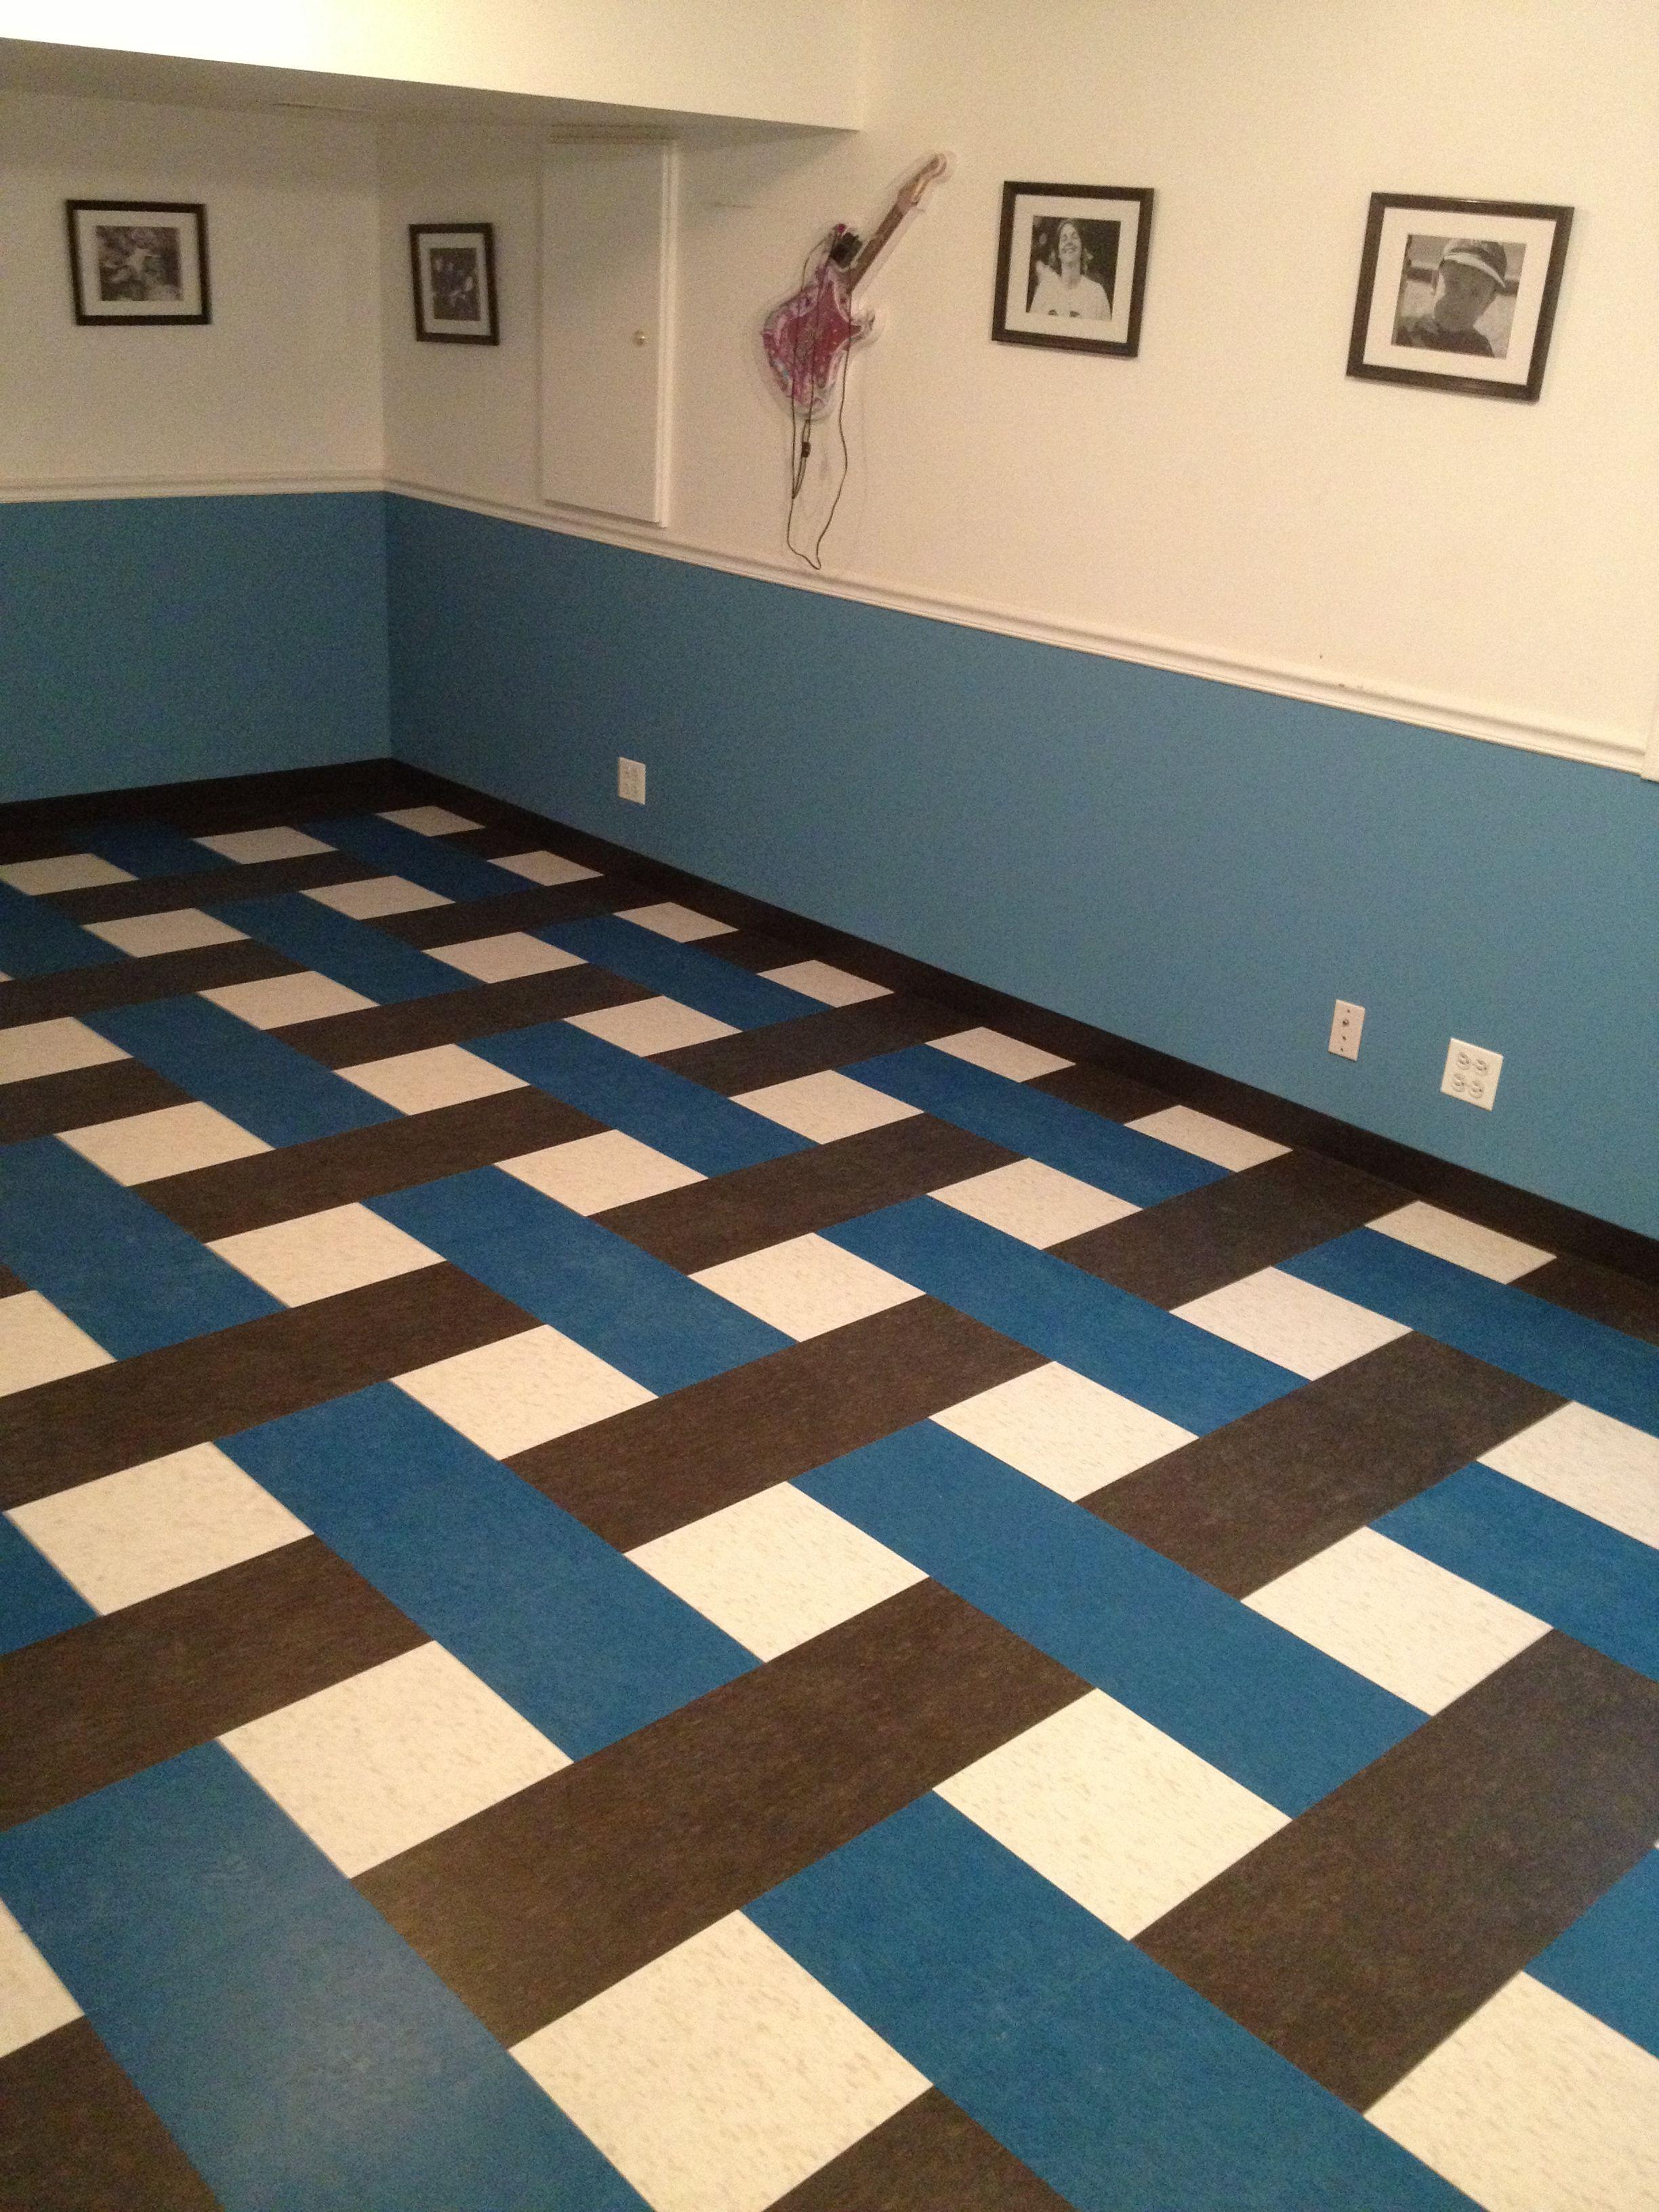 VCT (Vinyl Composite Tiles) in a basketweave pattern. It